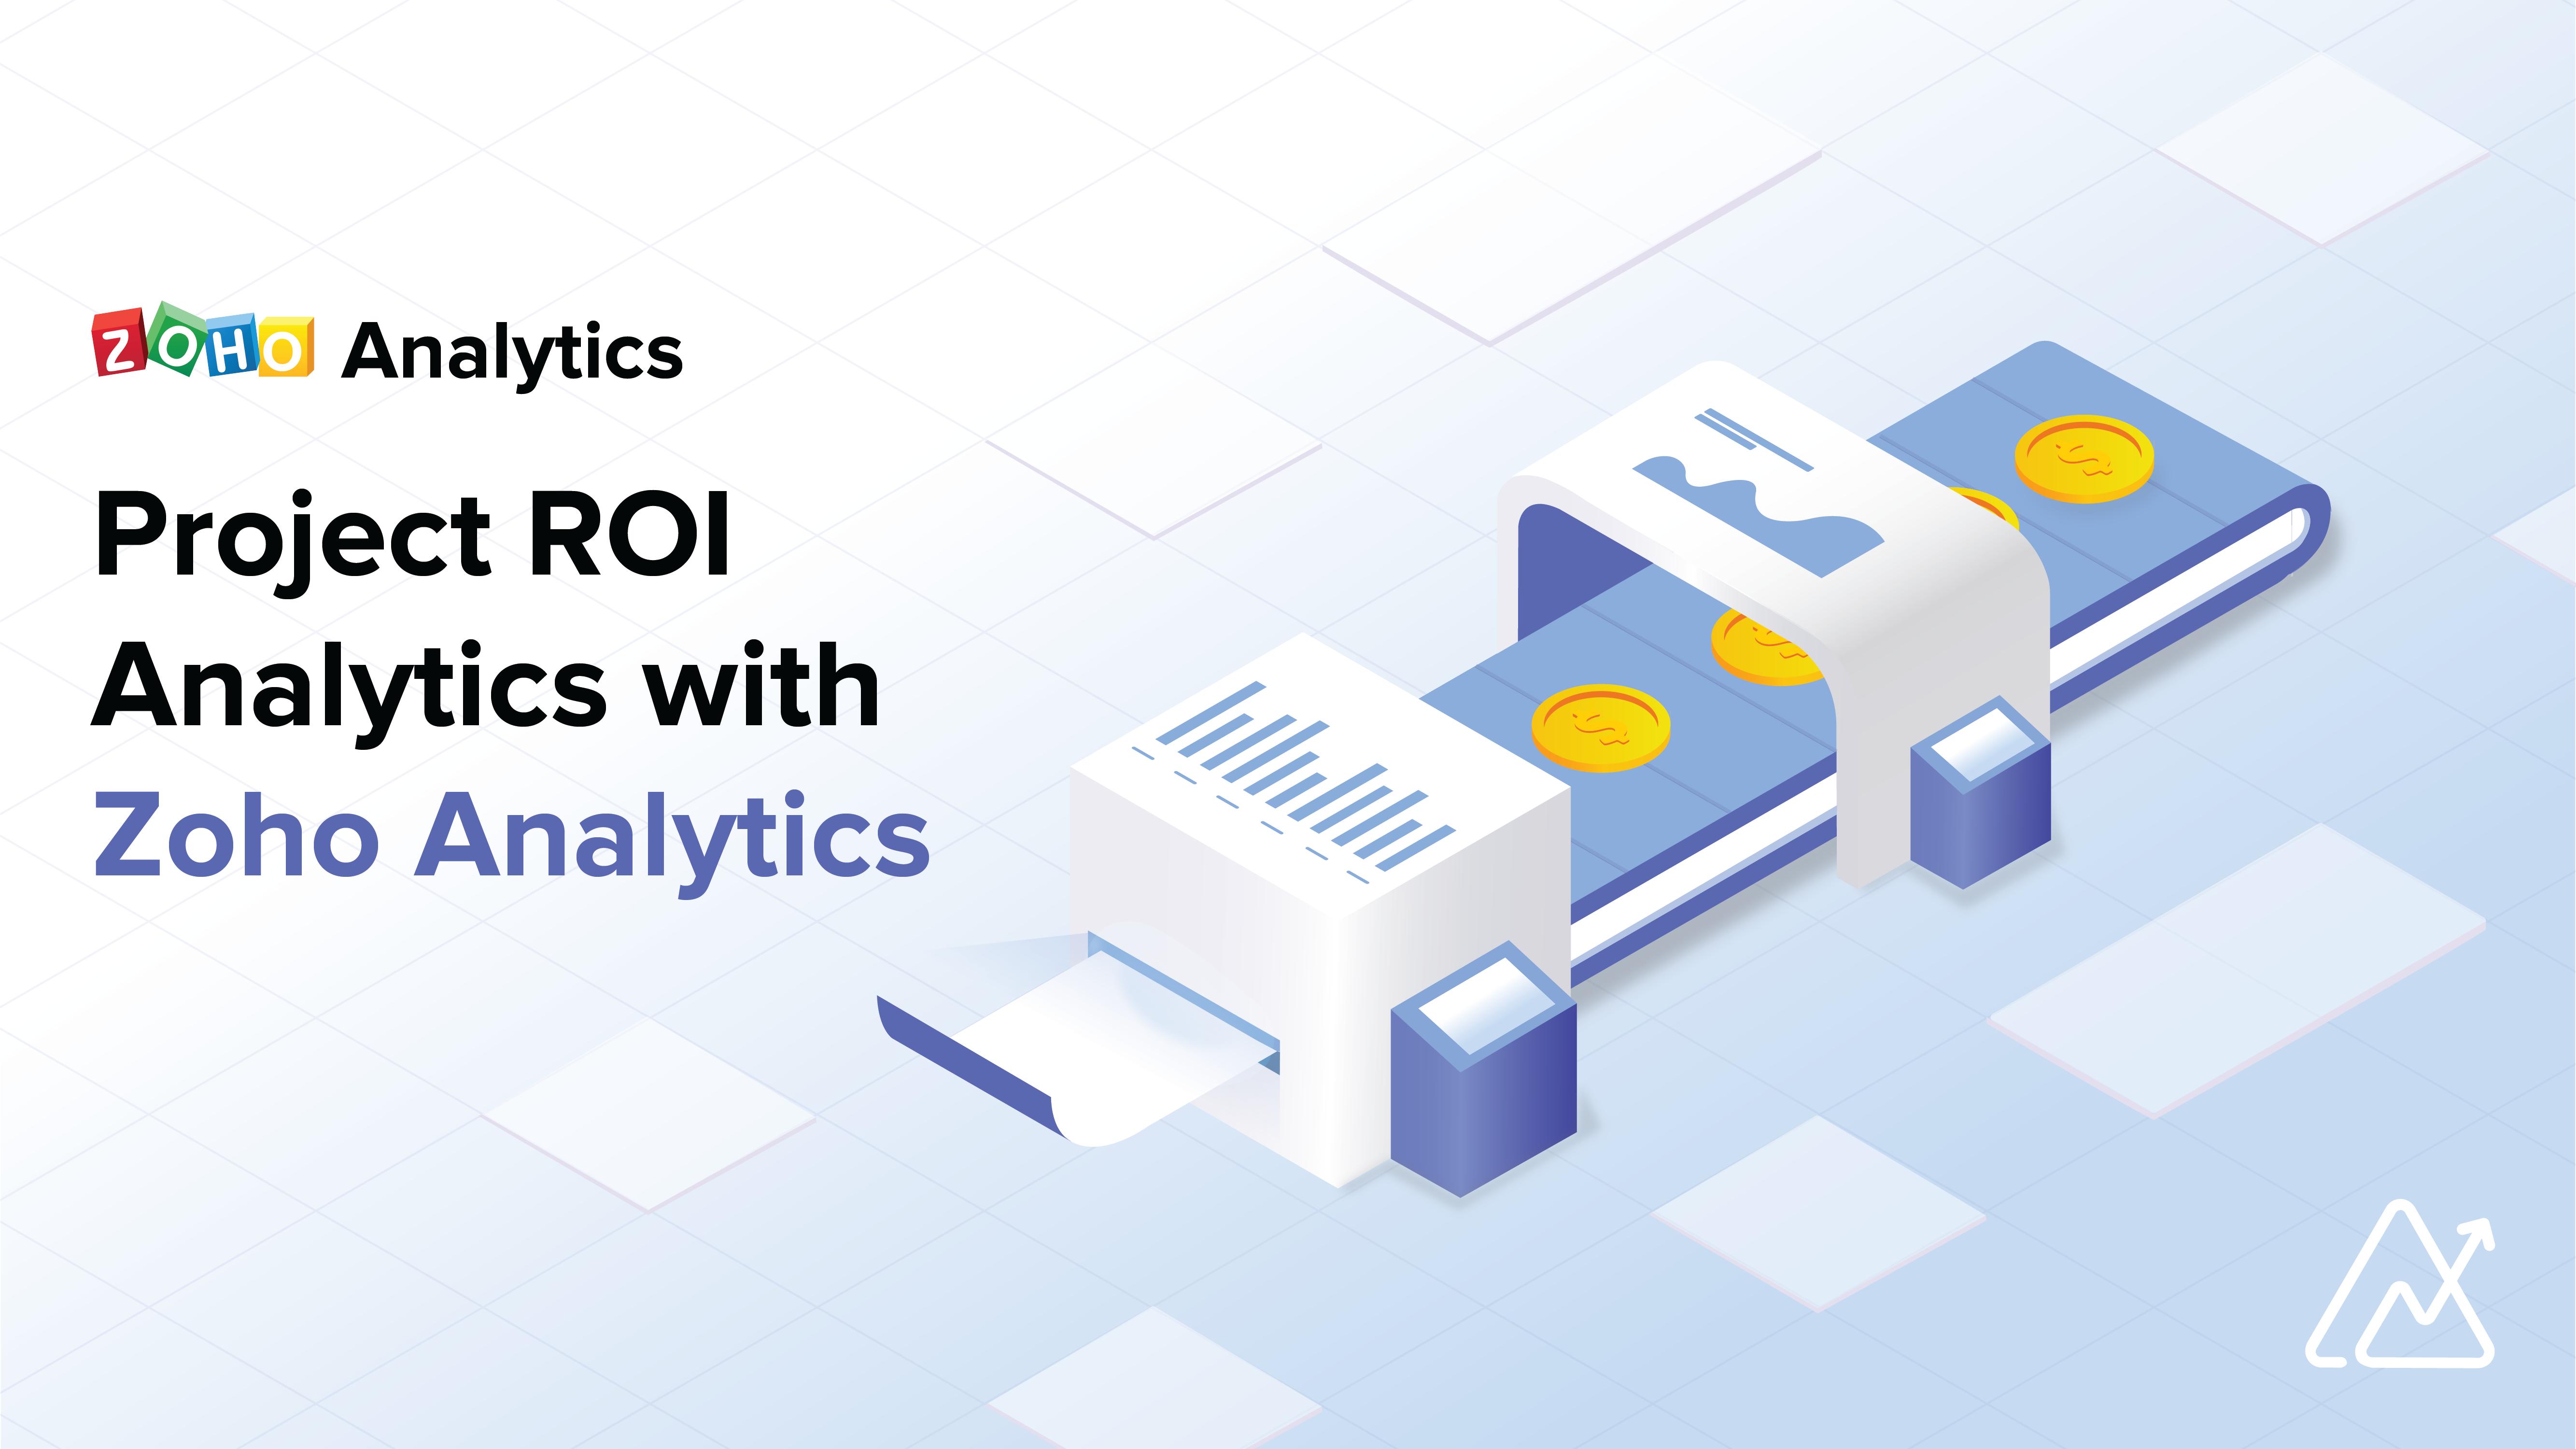 Project ROI Analytics with Zoho Analytics